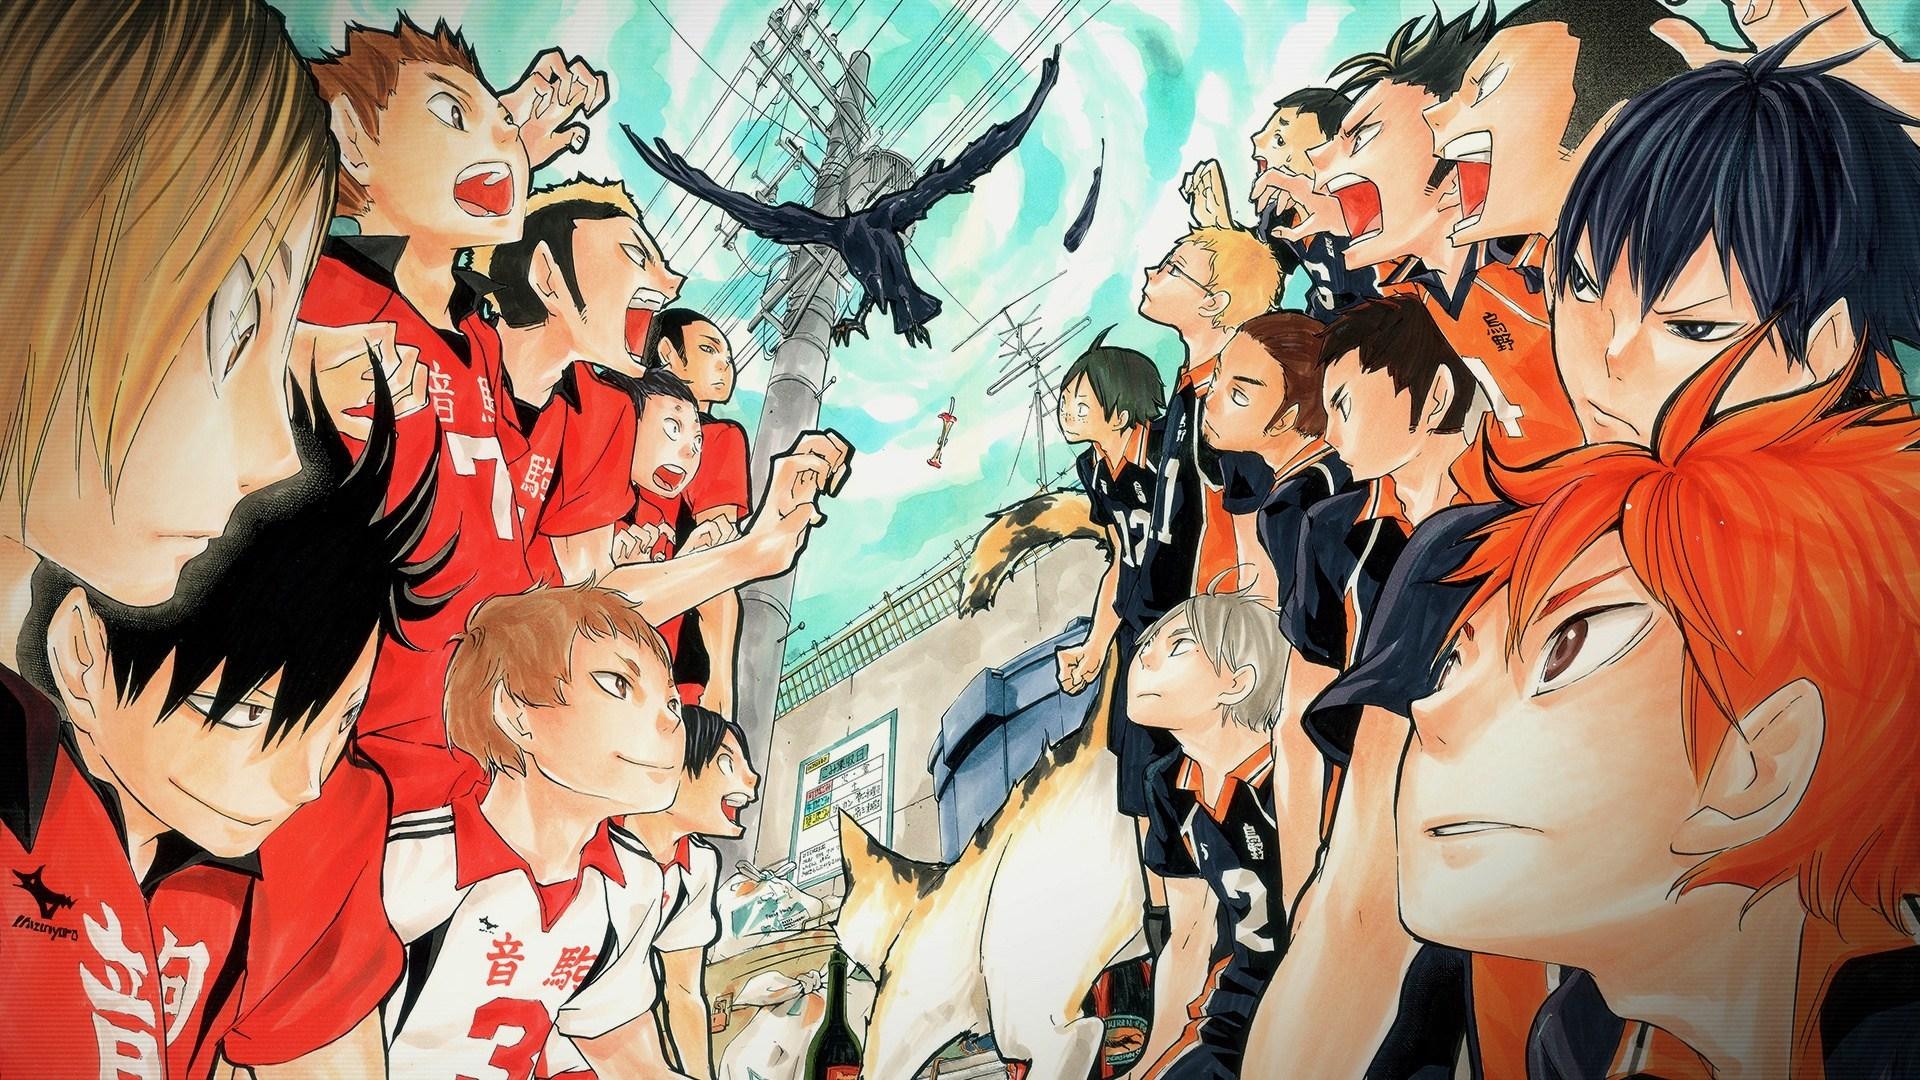 Haikyuu Karasuno Vs Nekoma - HD Wallpaper